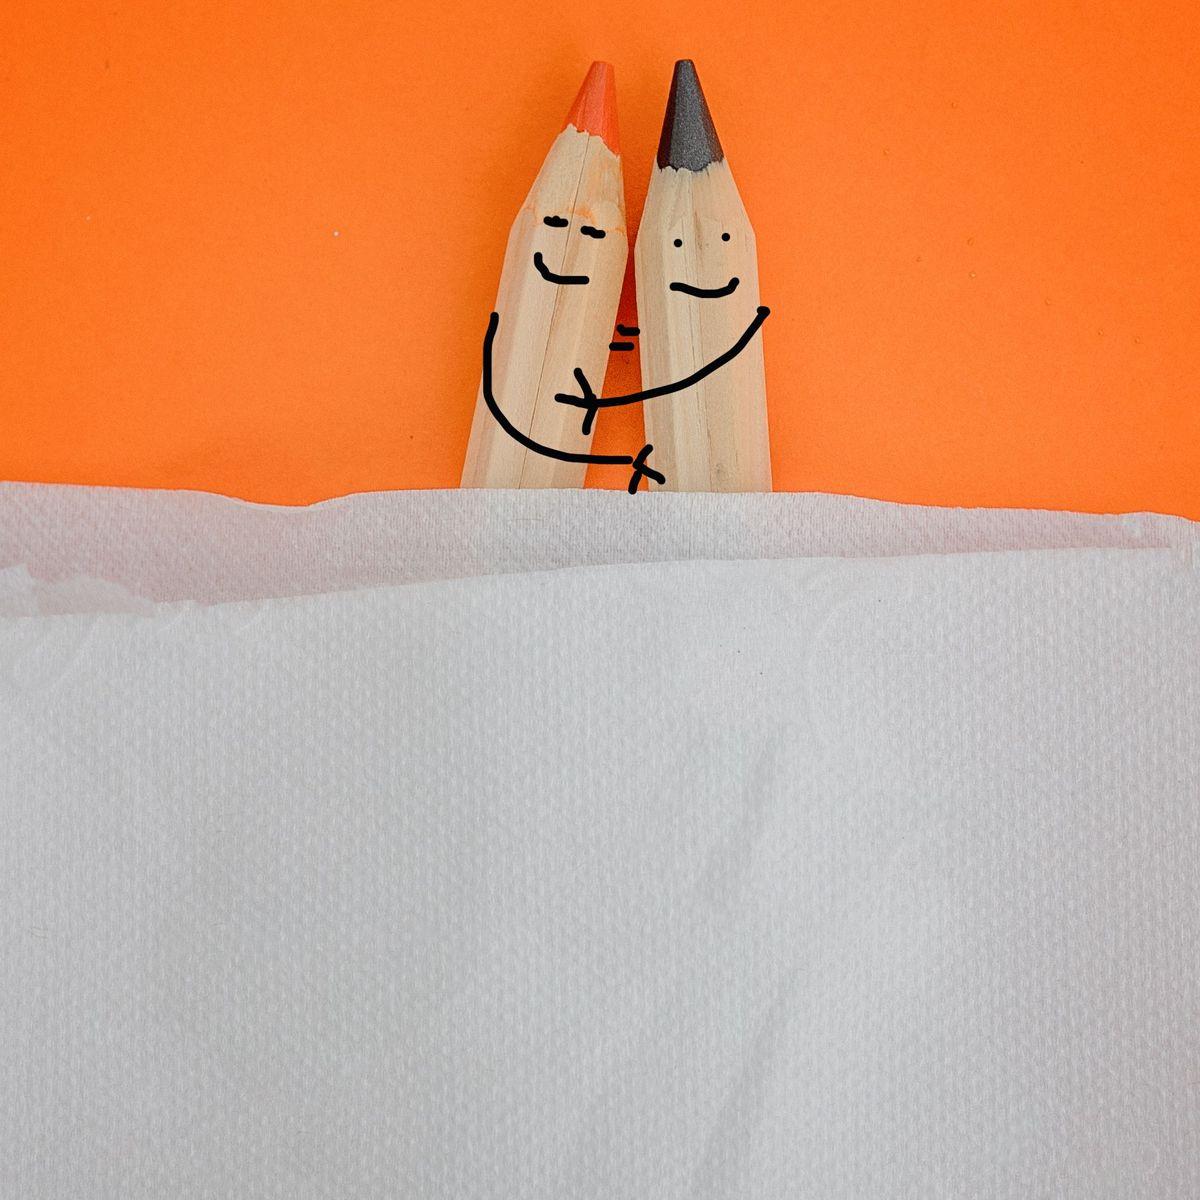 Cómo beneficiarse de Pillow Talk